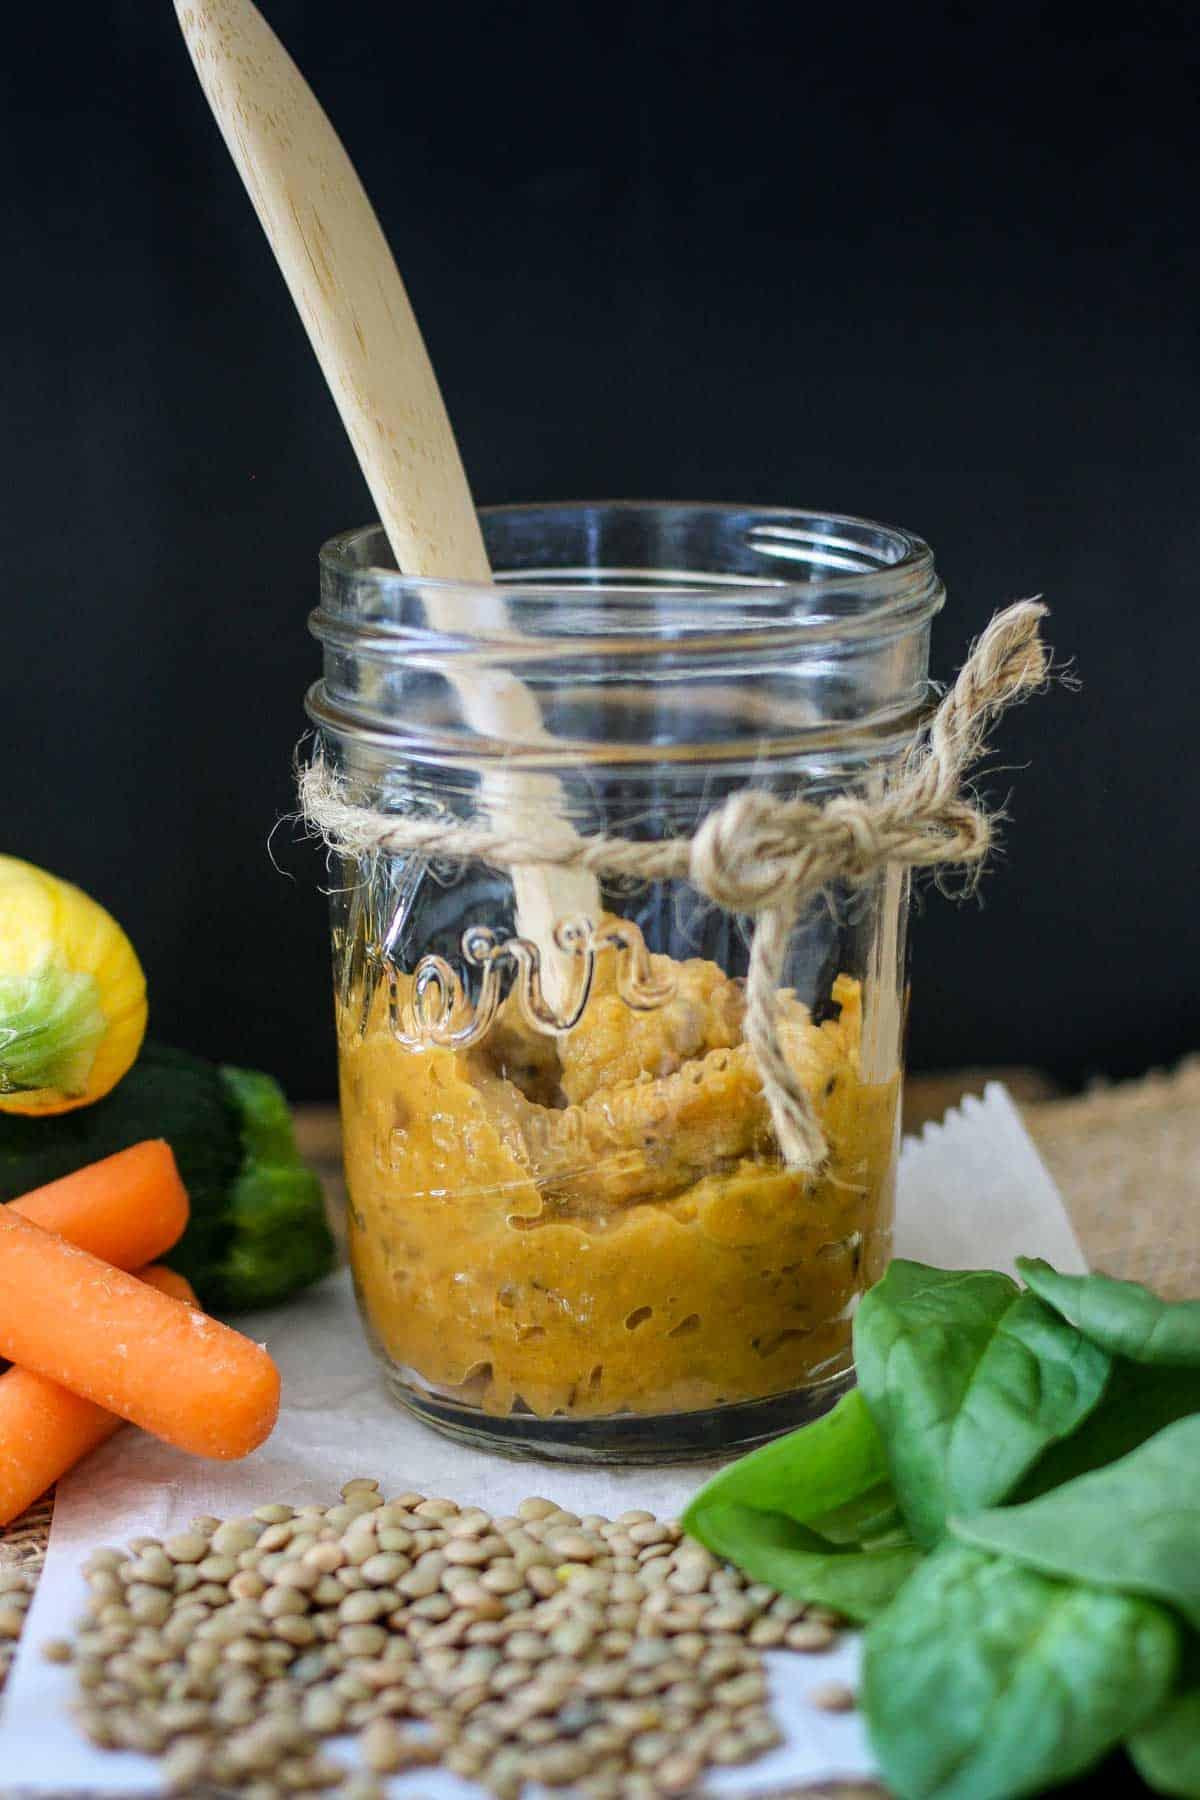 When Do Babies Eat Baby Jar Food